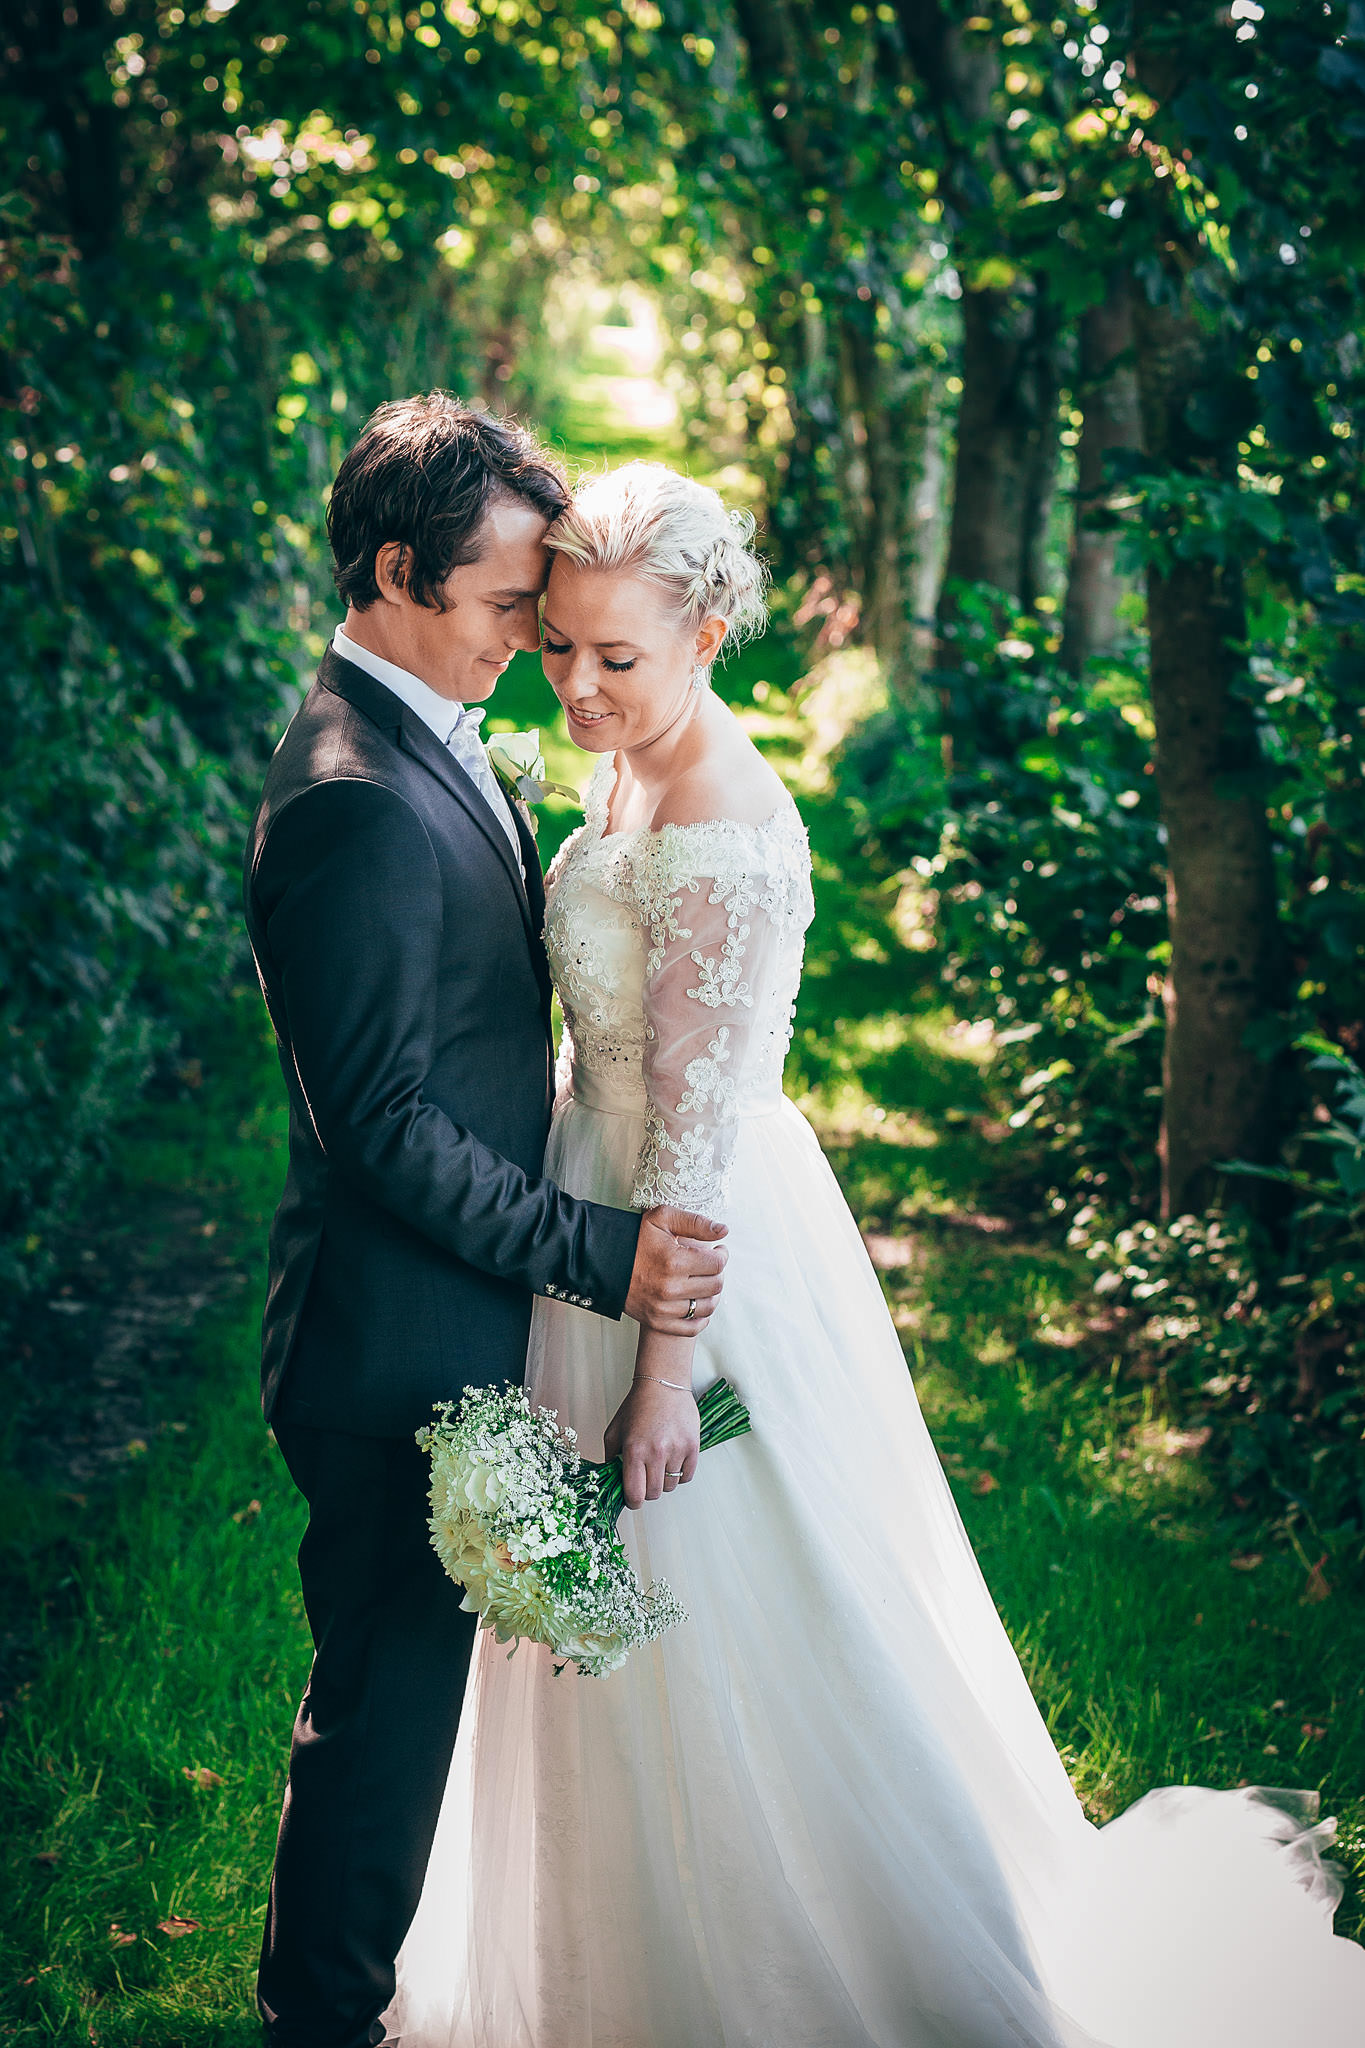 Wedding+Photographer+Norway+Bryllupsfotograf+Casey+Arneson+JT-100.jpg